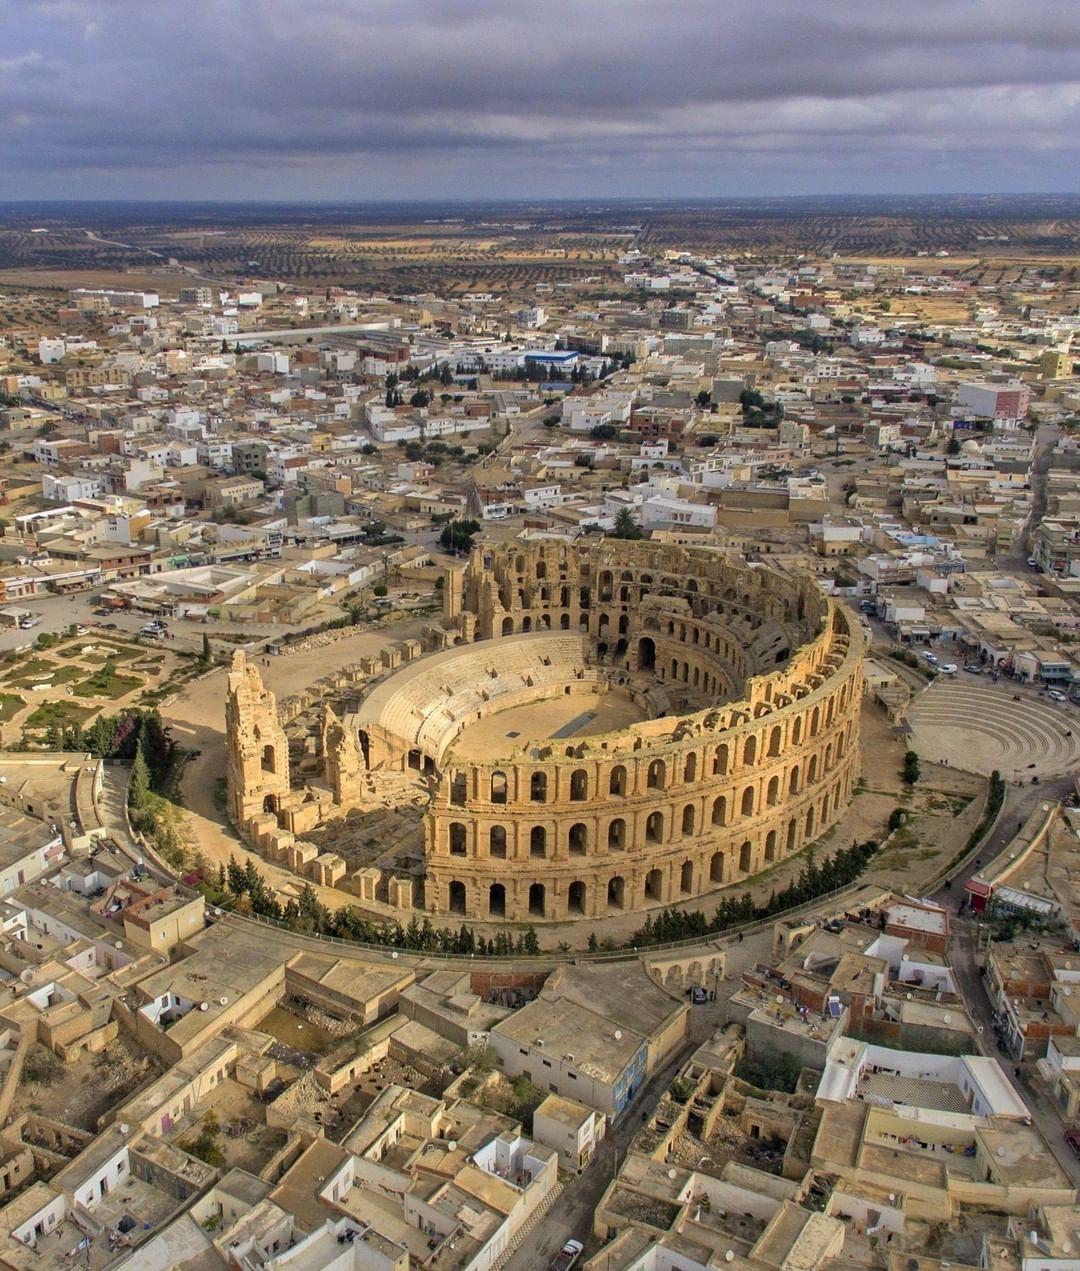 tunisia in tourist destinations in africa